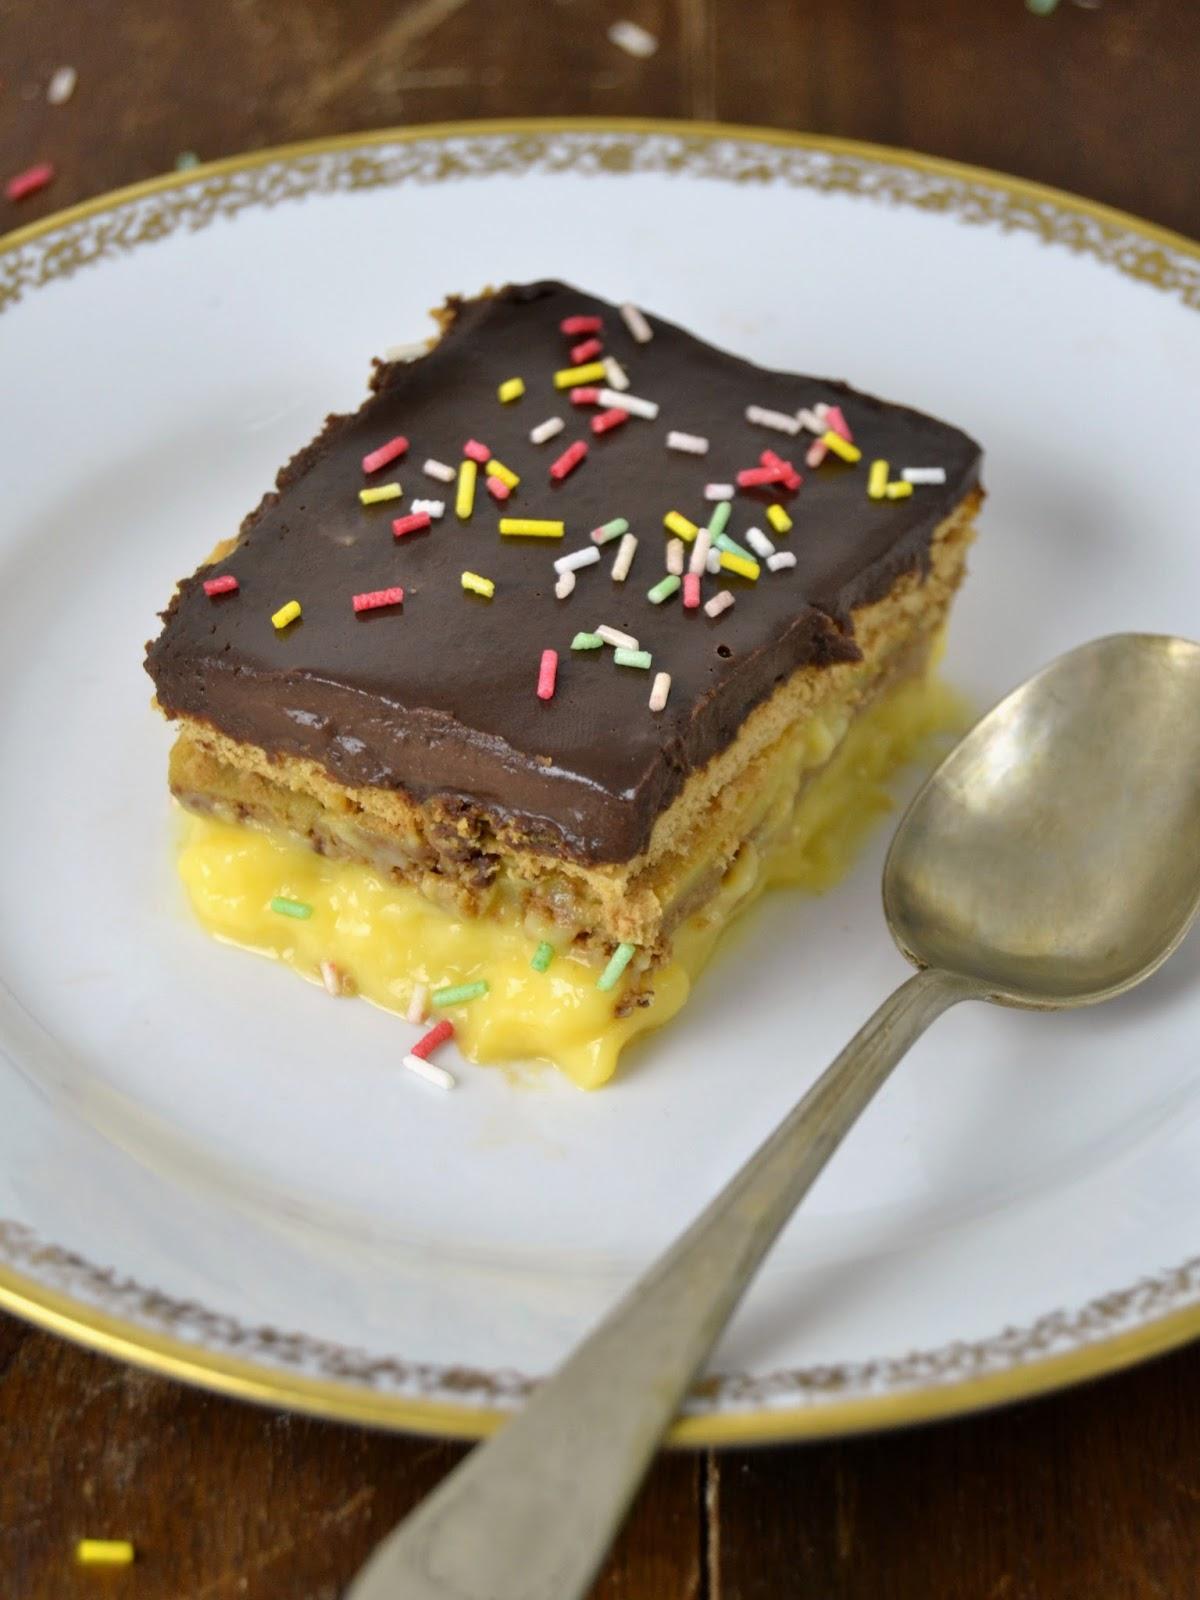 Tarta de flan, galletas y chocolate. tarta de la abuela